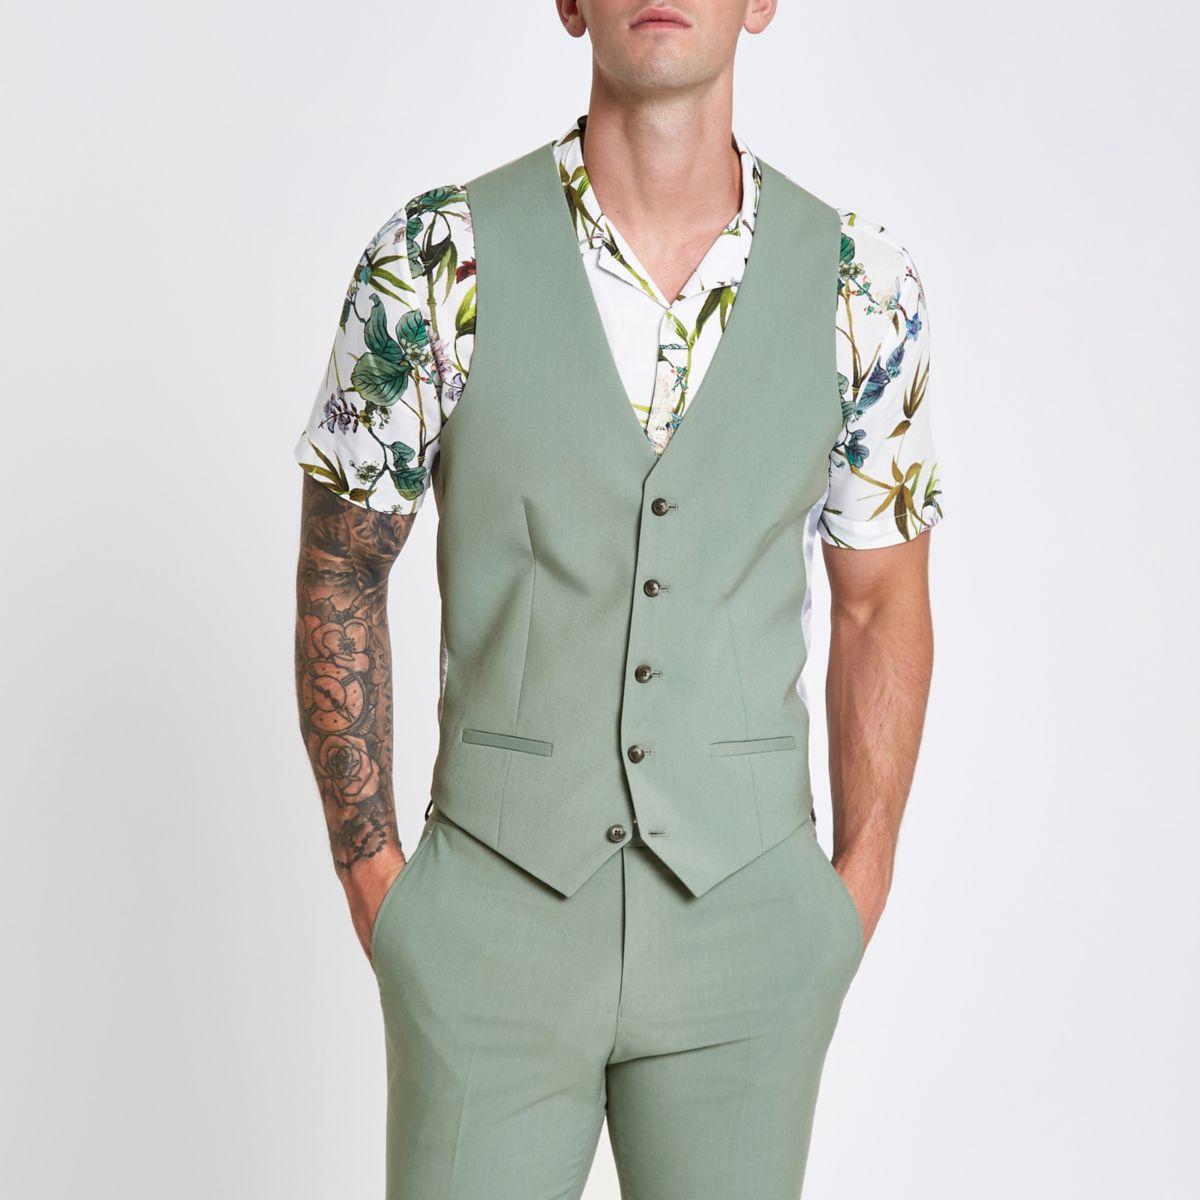 Mint green suit waistcoat